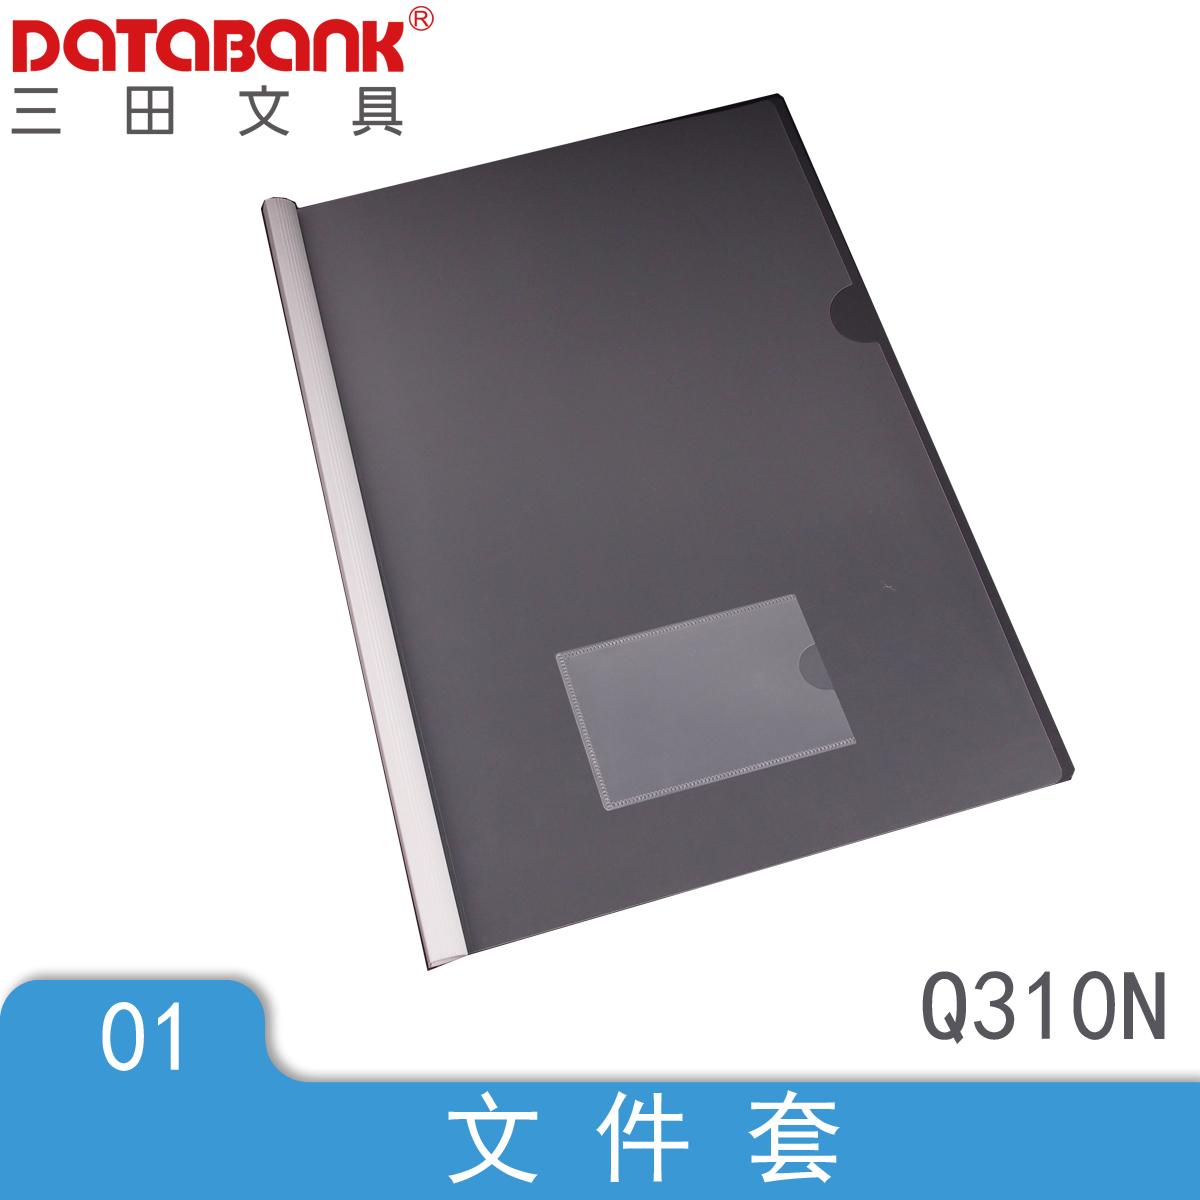 Q310N 附名片型Q-310板片(打裝) (Q310N) 文件夾批發零售 優惠團購價 學校公家機關愛用 DATABANK